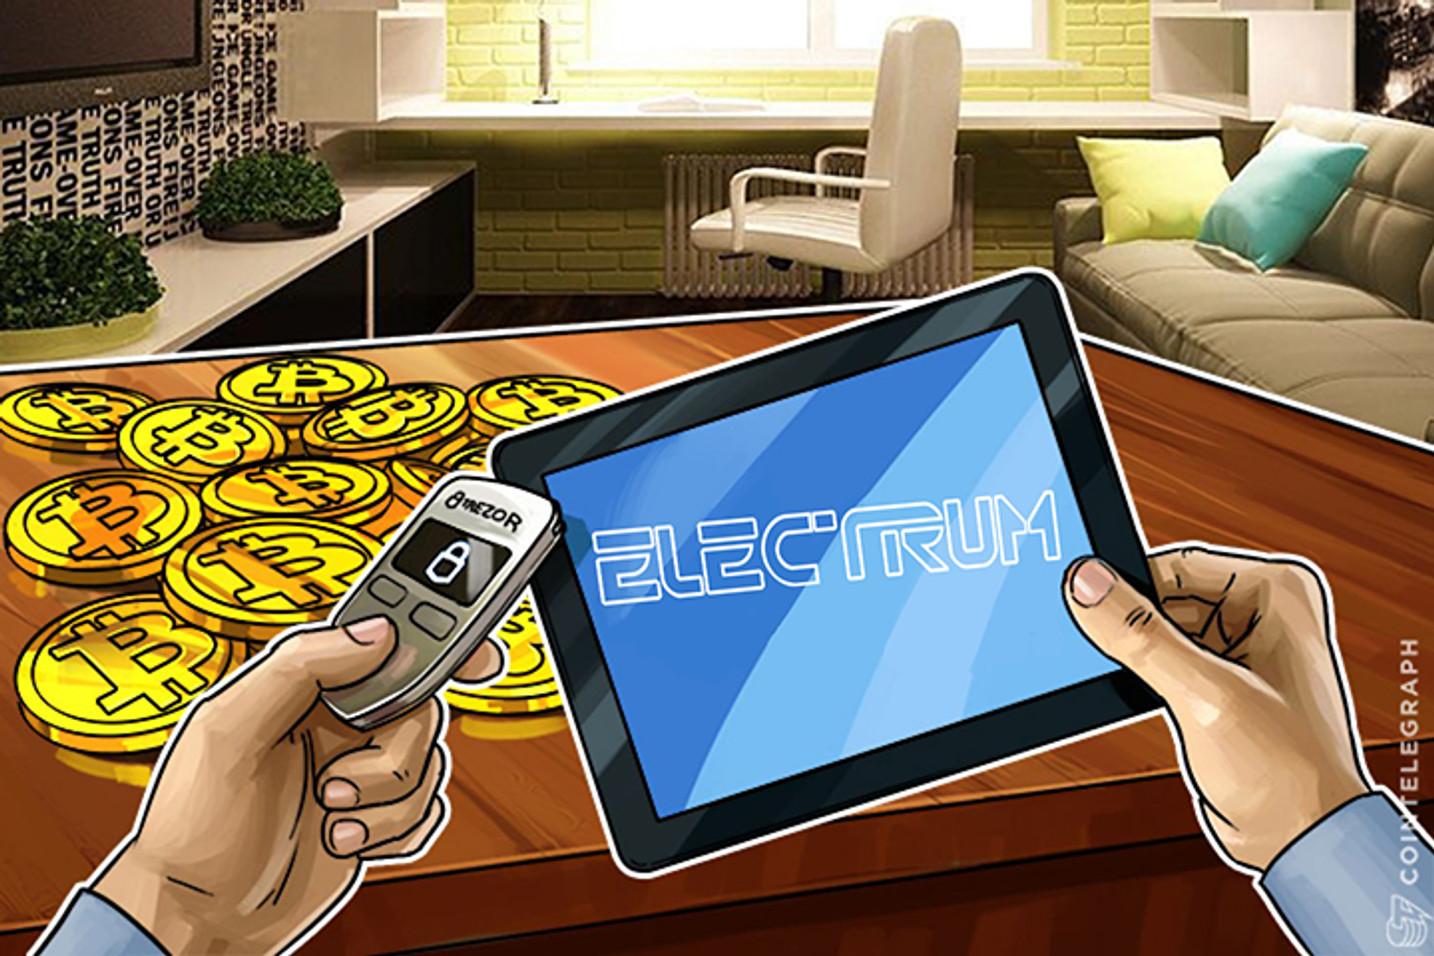 Bitcoin Wallets Trezor, Electrum Issue Contradictory Statements Regarding Bitcoin Cash